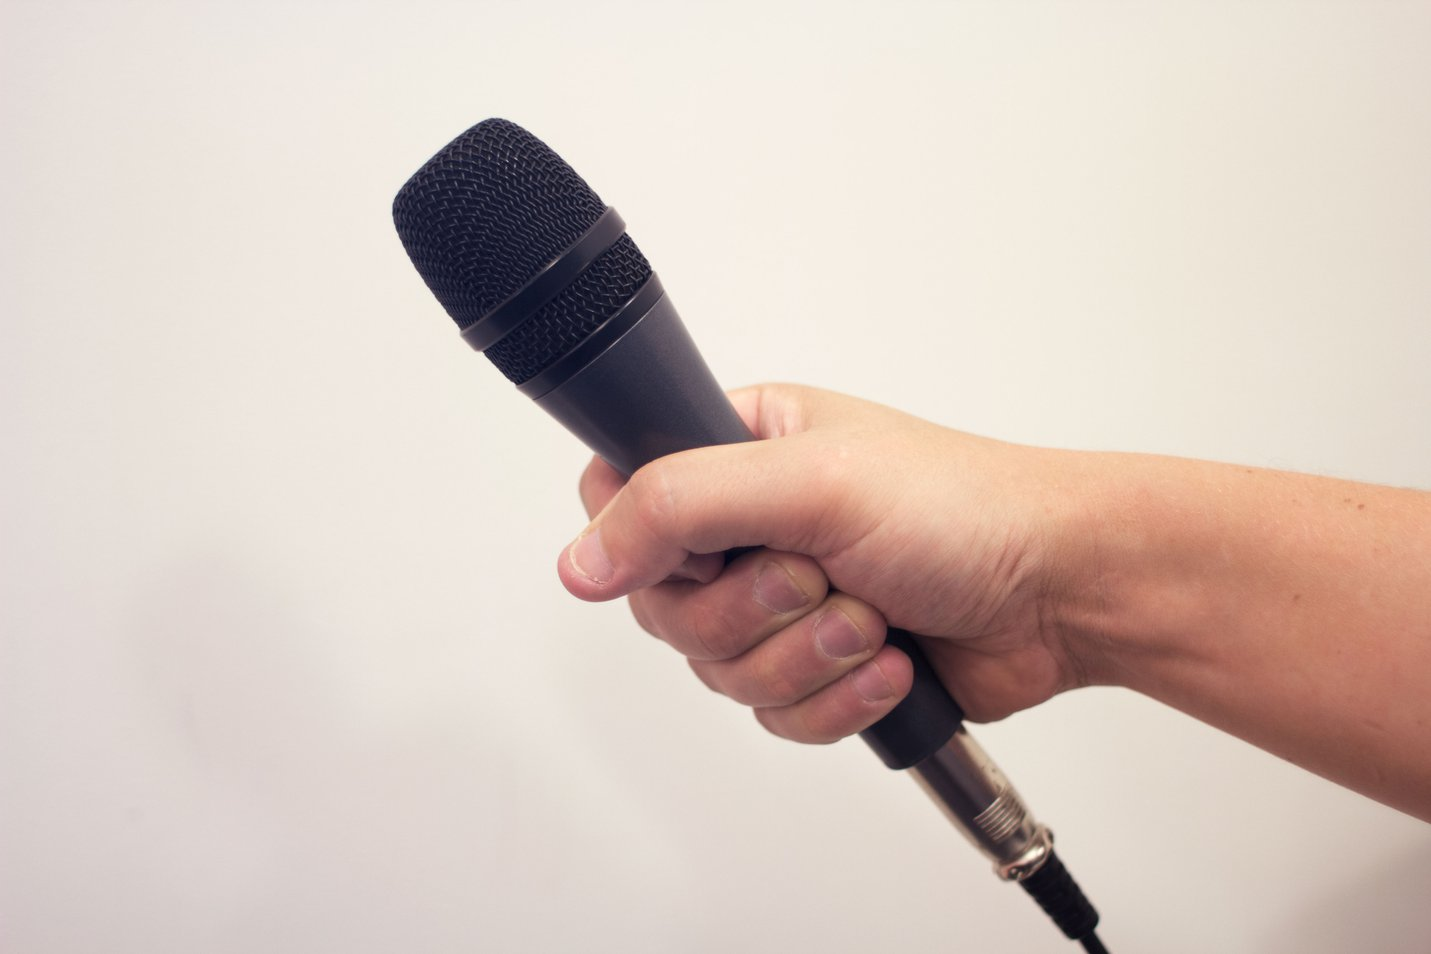 Hand held microphone